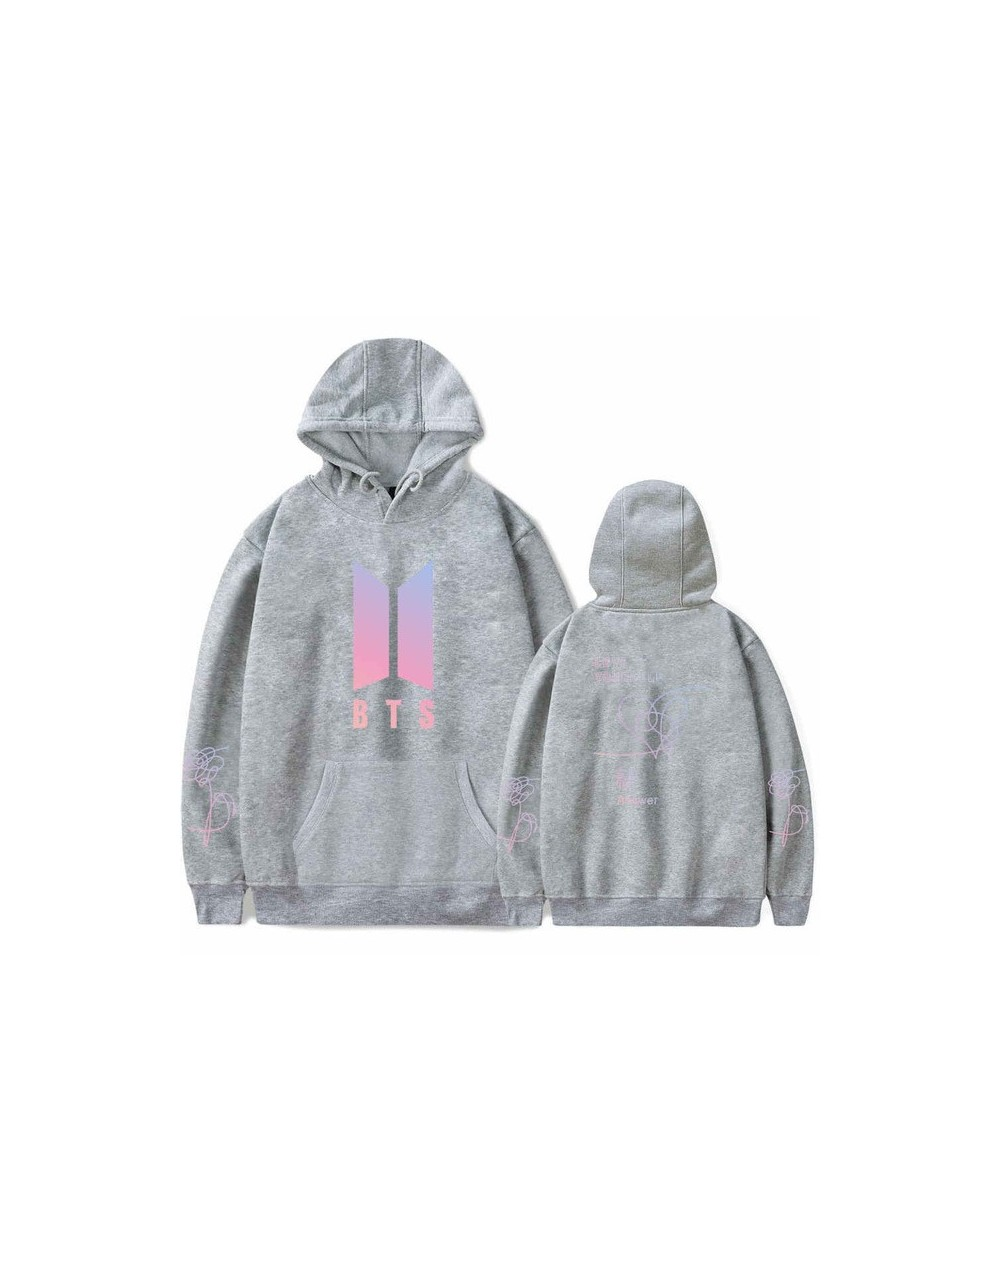 Winter Bangtan Boys Fashion Harajuku Hoodies Women LOVE Yourself Answer New Album Hooded Sweatshirt Women Men Fans Kpop Clot...